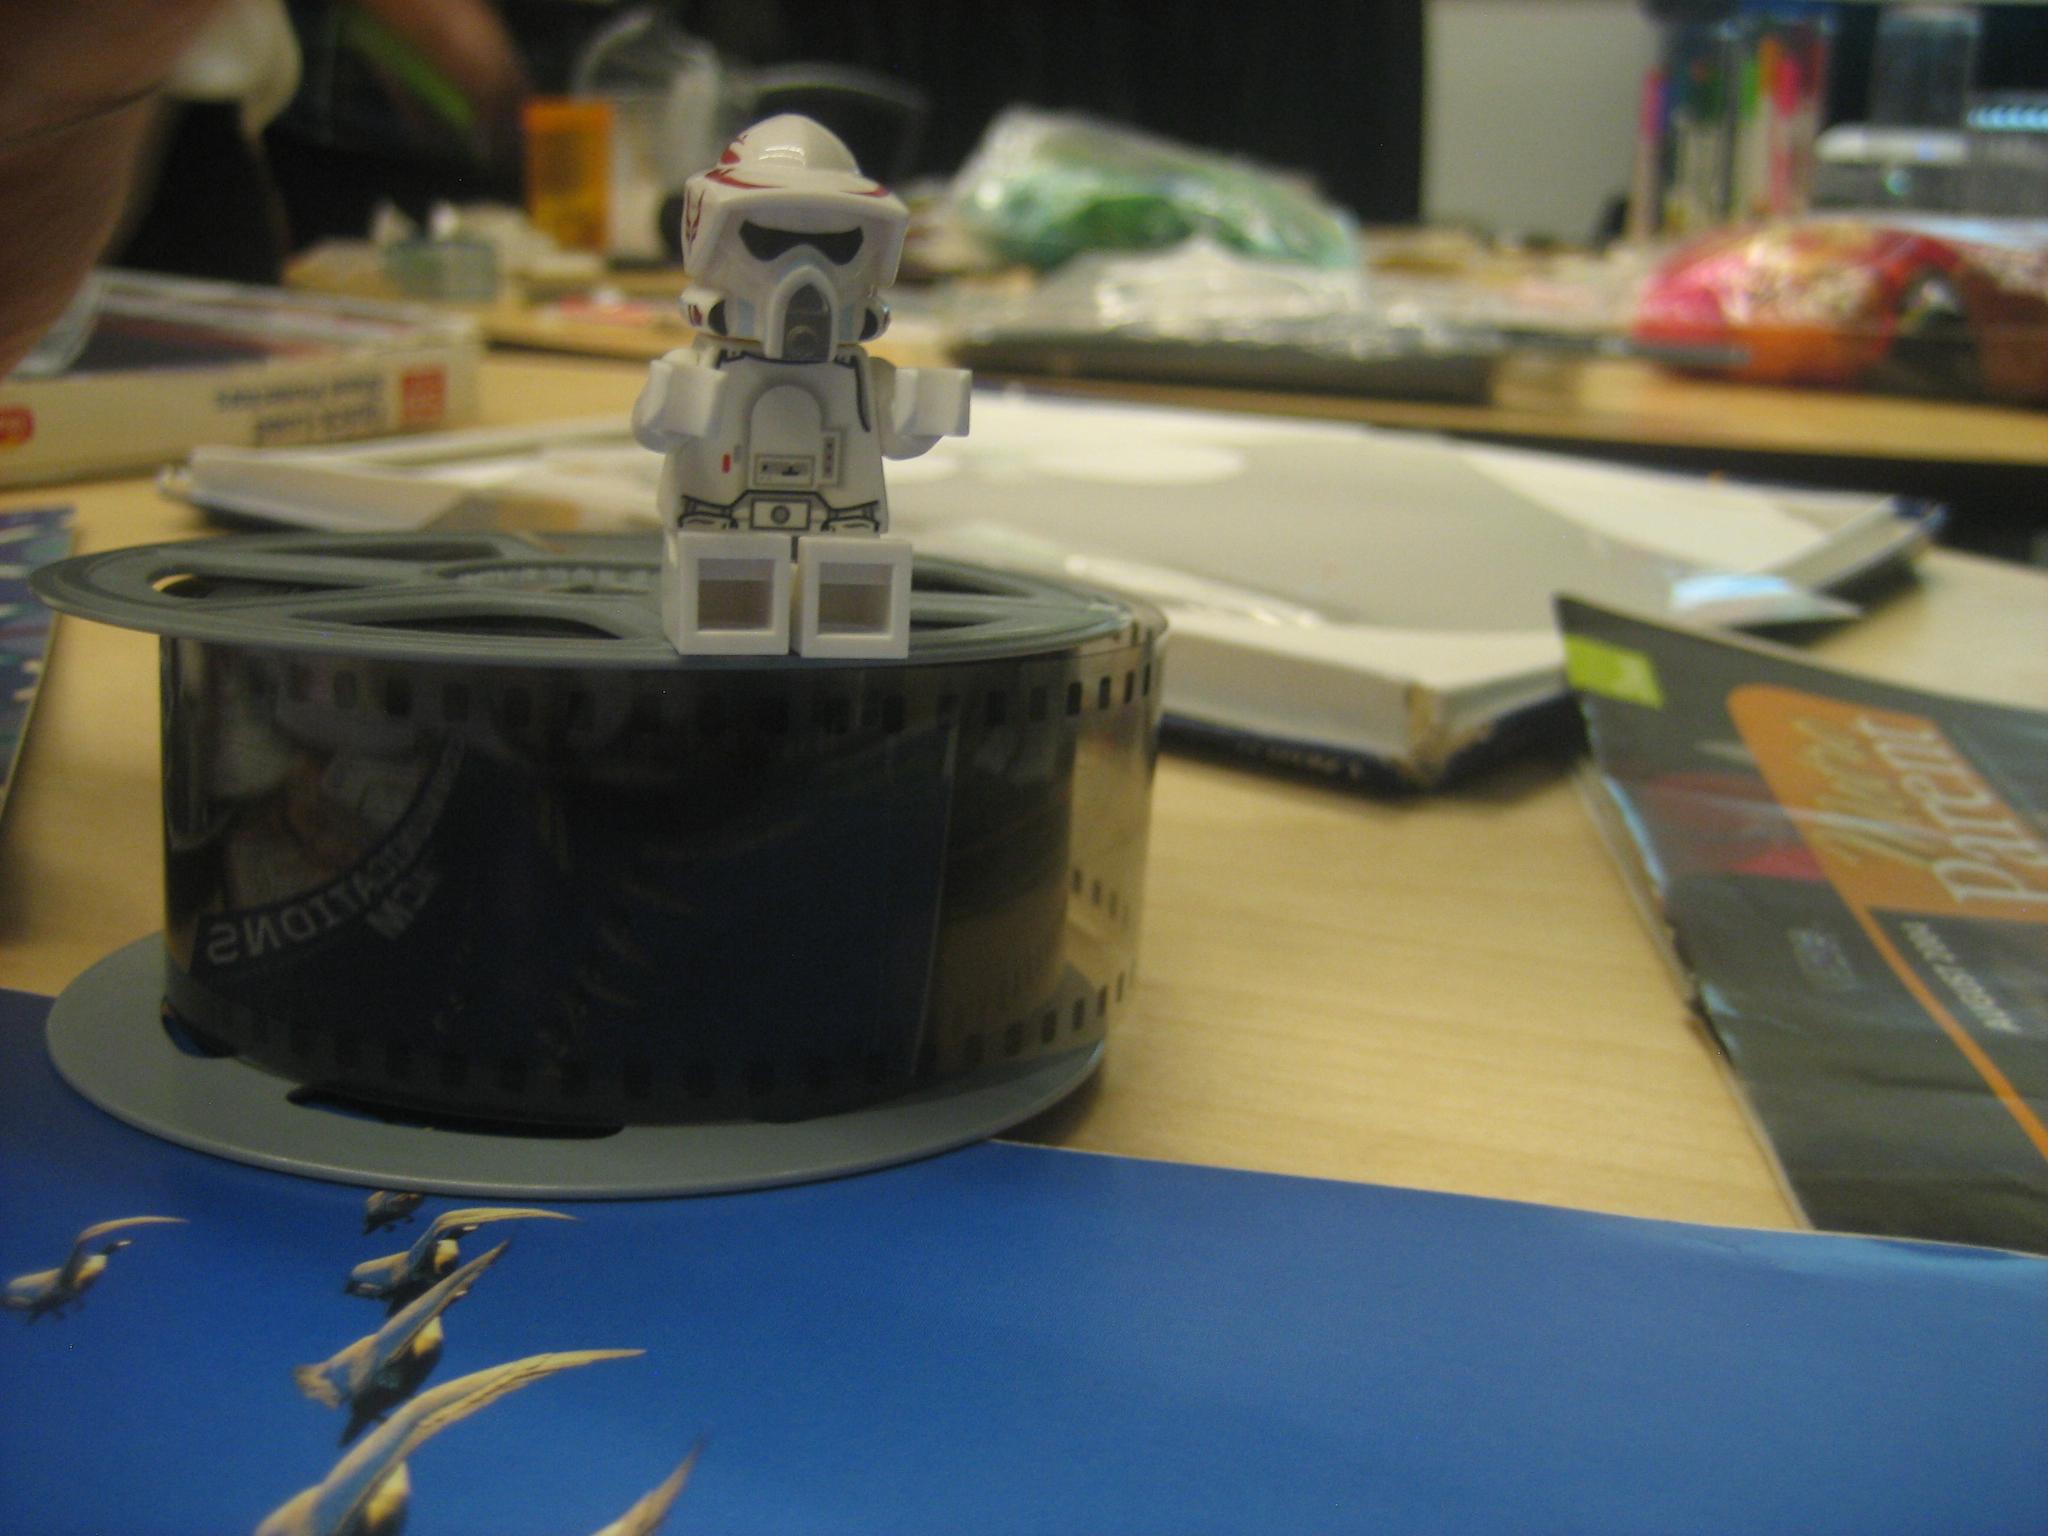 photo of toy figure on microfiche spool